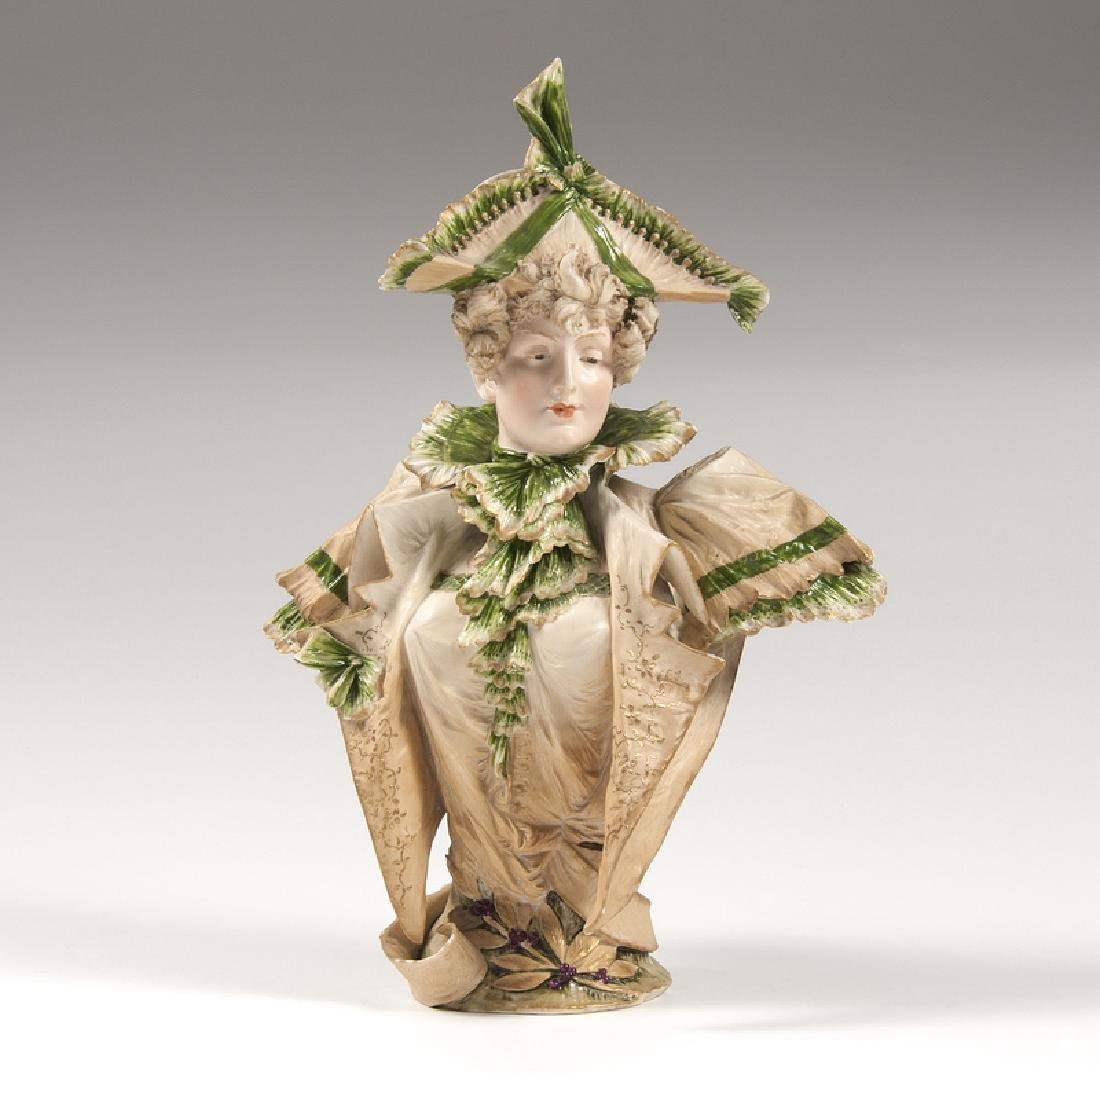 Ernst Wahliss (Austrian, 1837-1900) Porcelain Bust